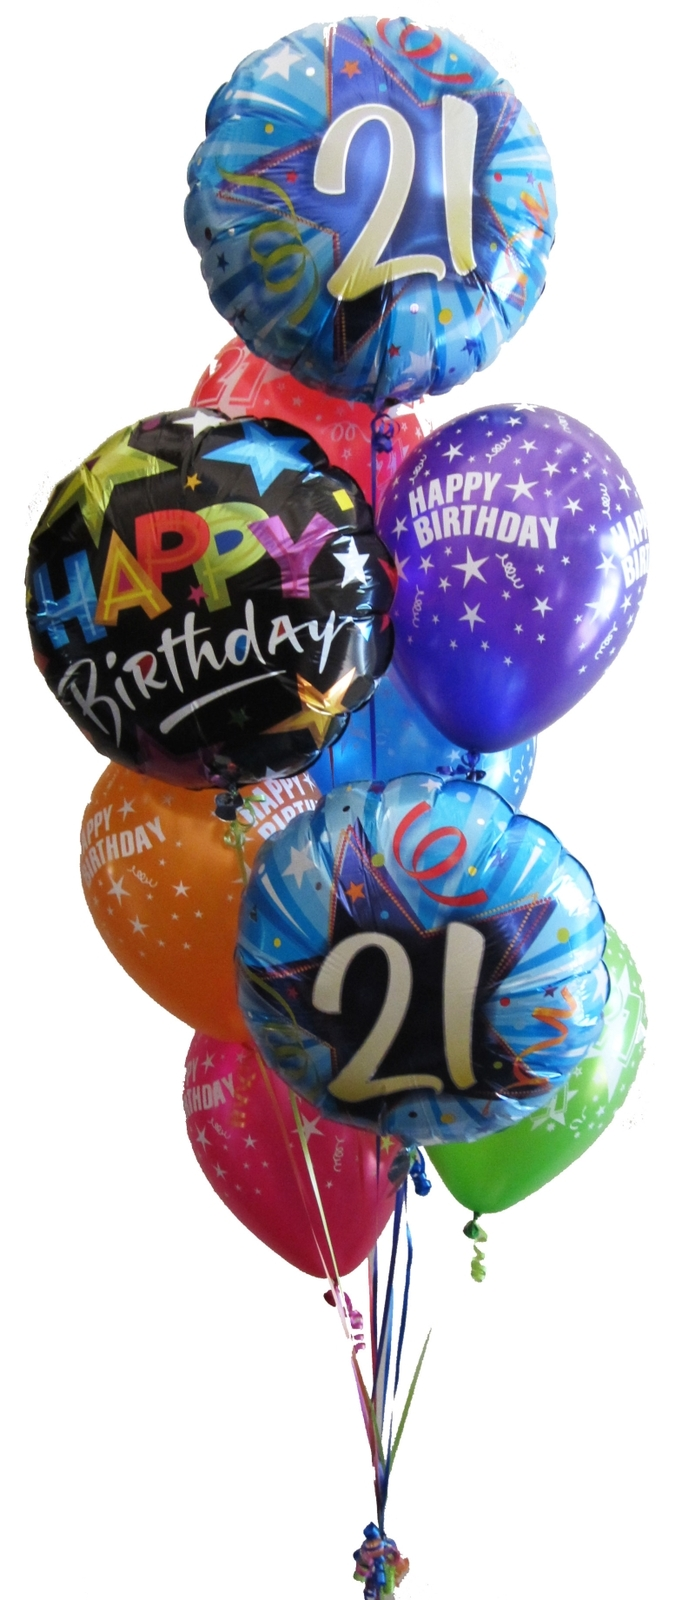 21st Birthday Balloon Bouquets